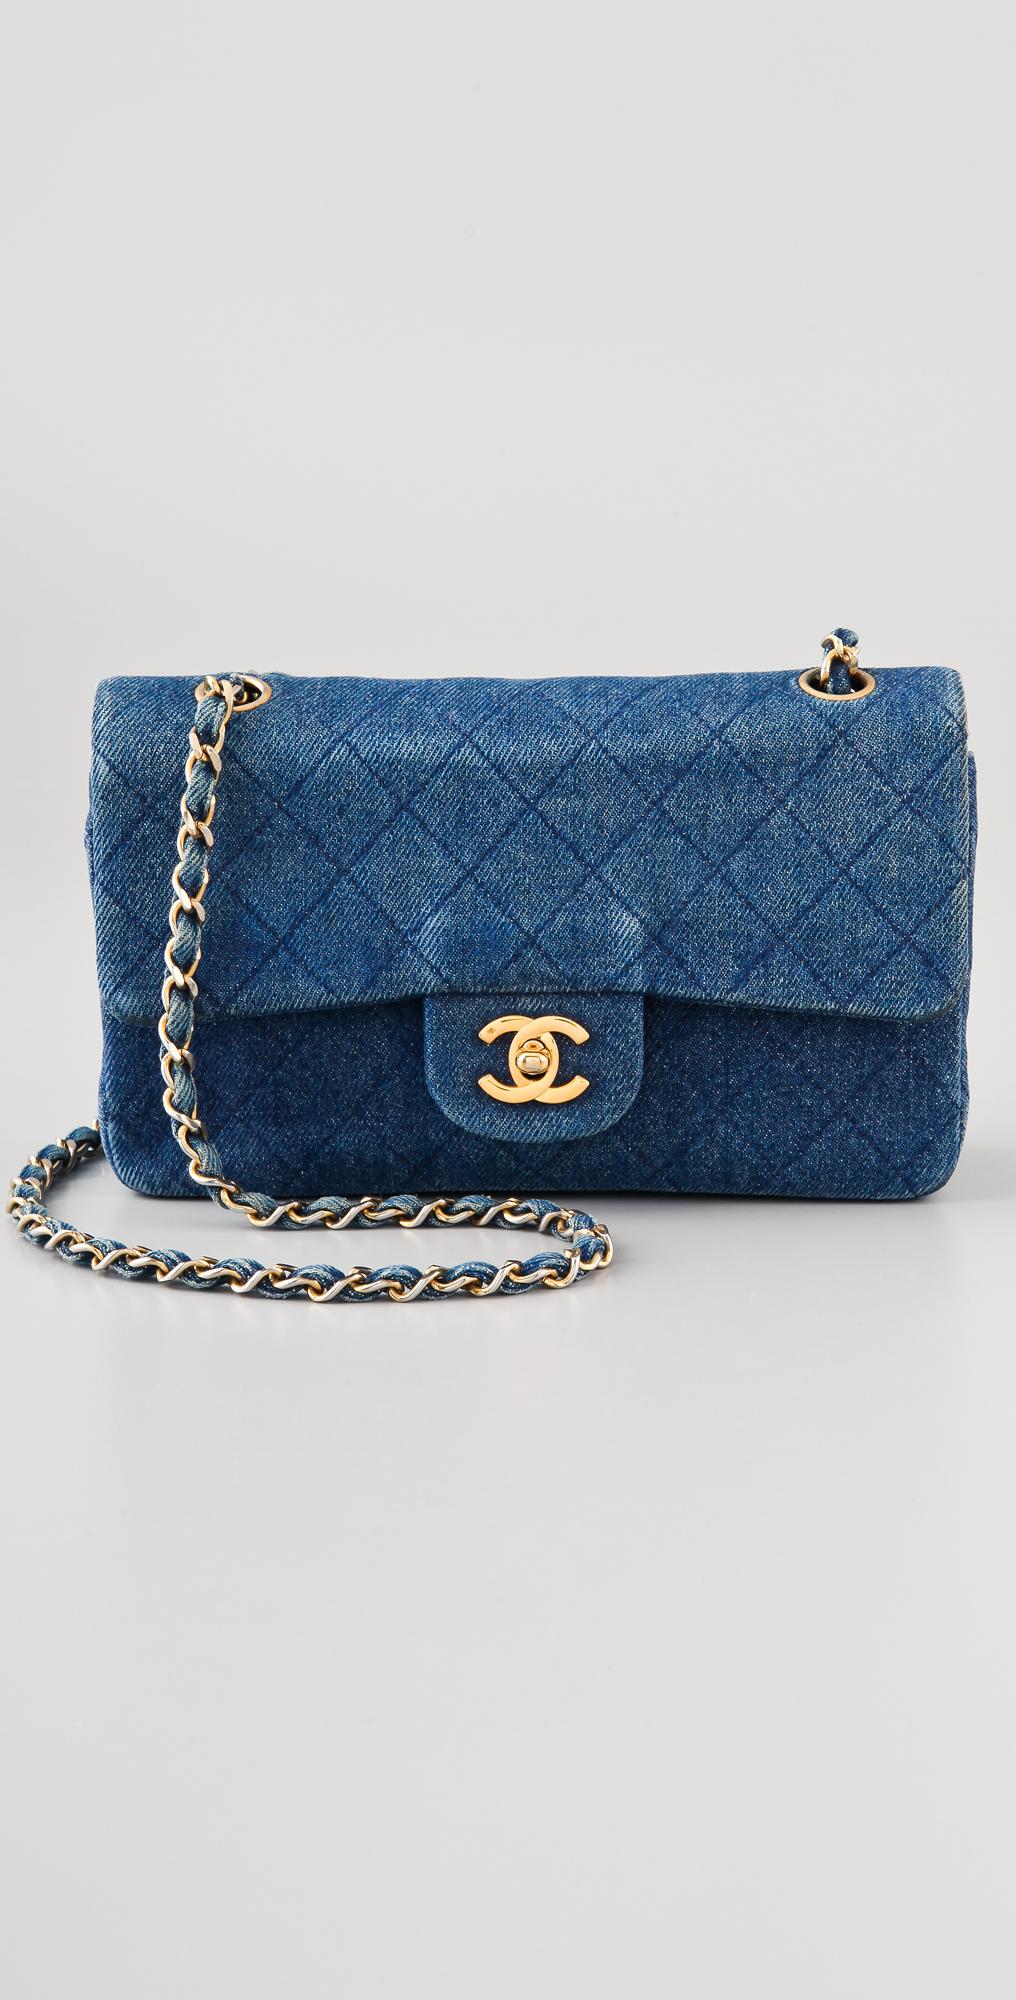 cce7e8cee8ad8e WGACA Vintage Vintage Chanel Quilted Denim Bag | SHOPBOP